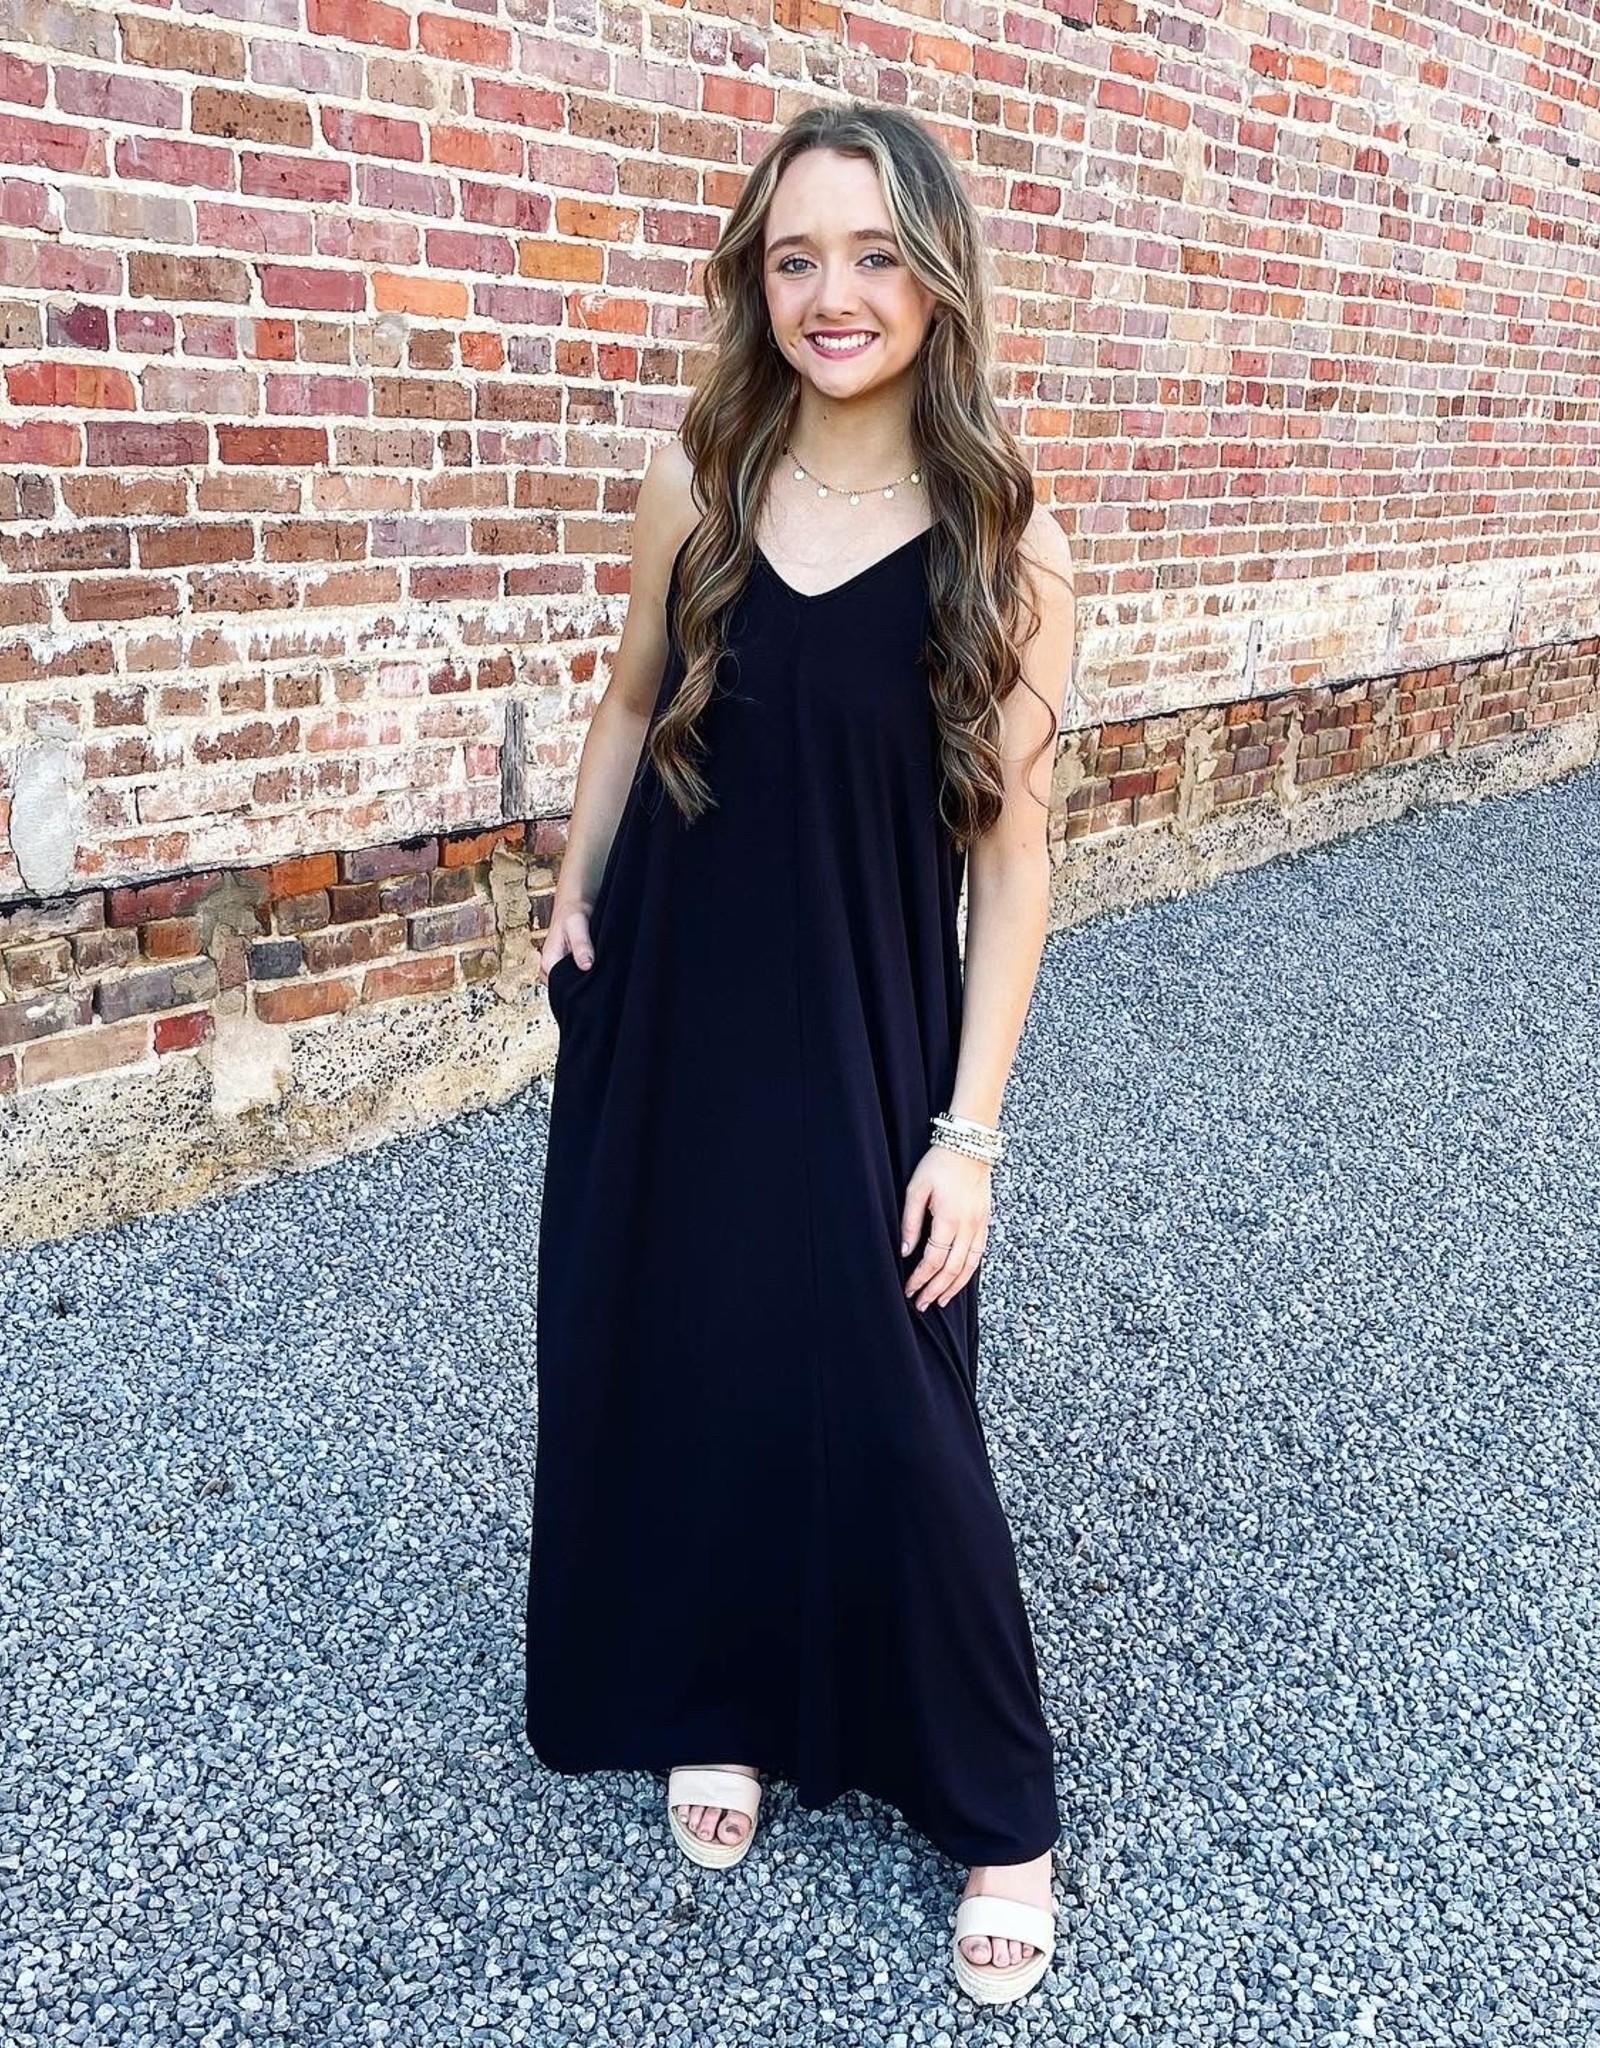 Chasidy Maxi Dress in Black